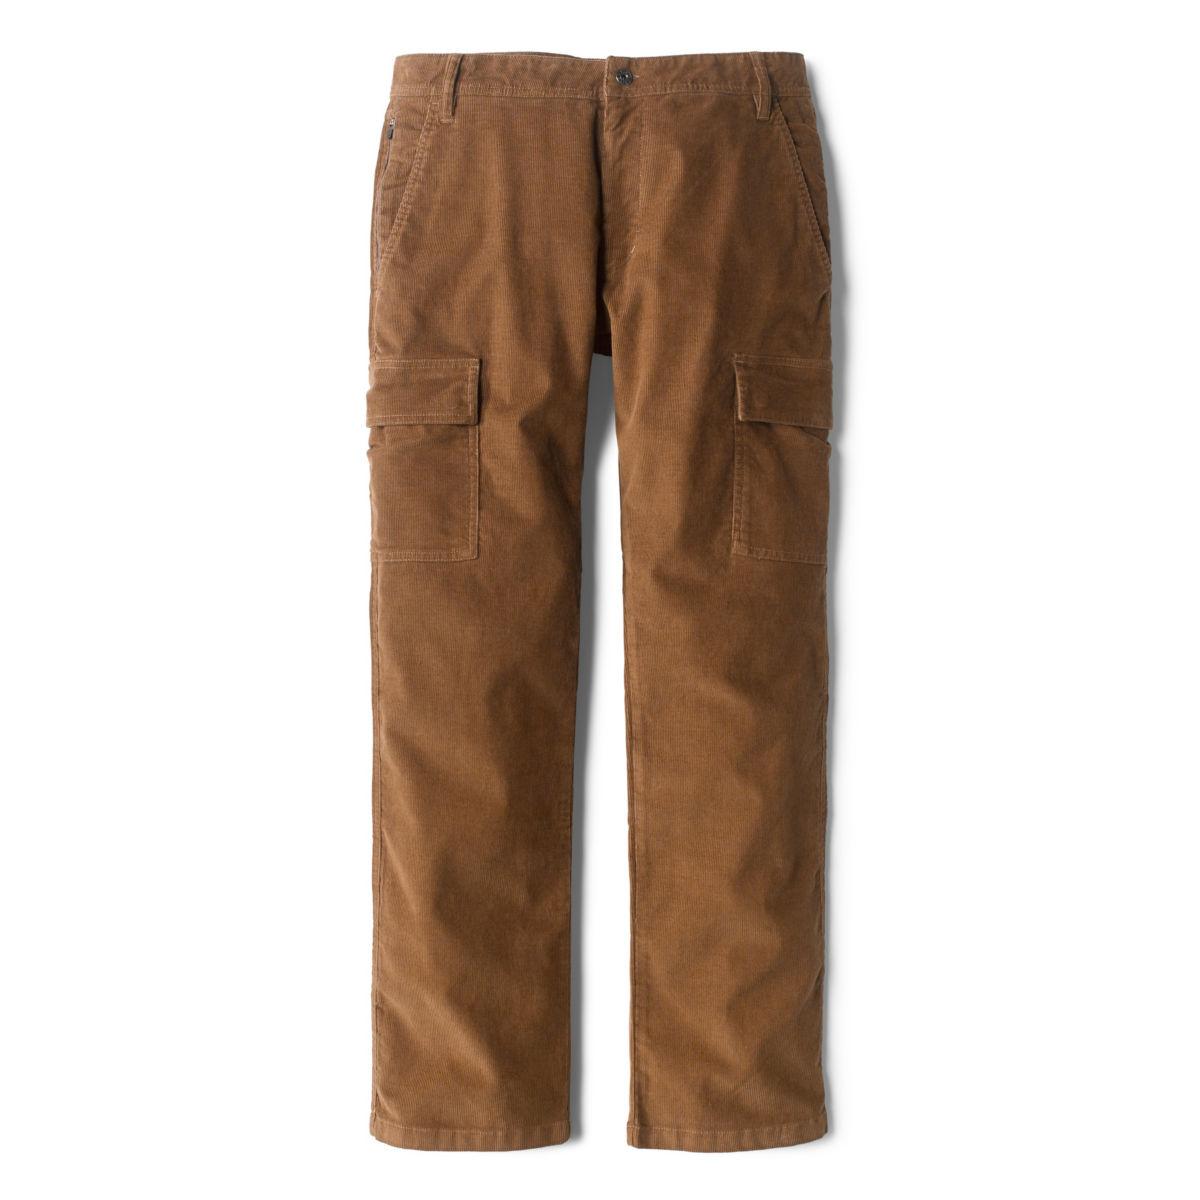 Stretch Corduroy Cargo Pants - TOBACCOimage number 0